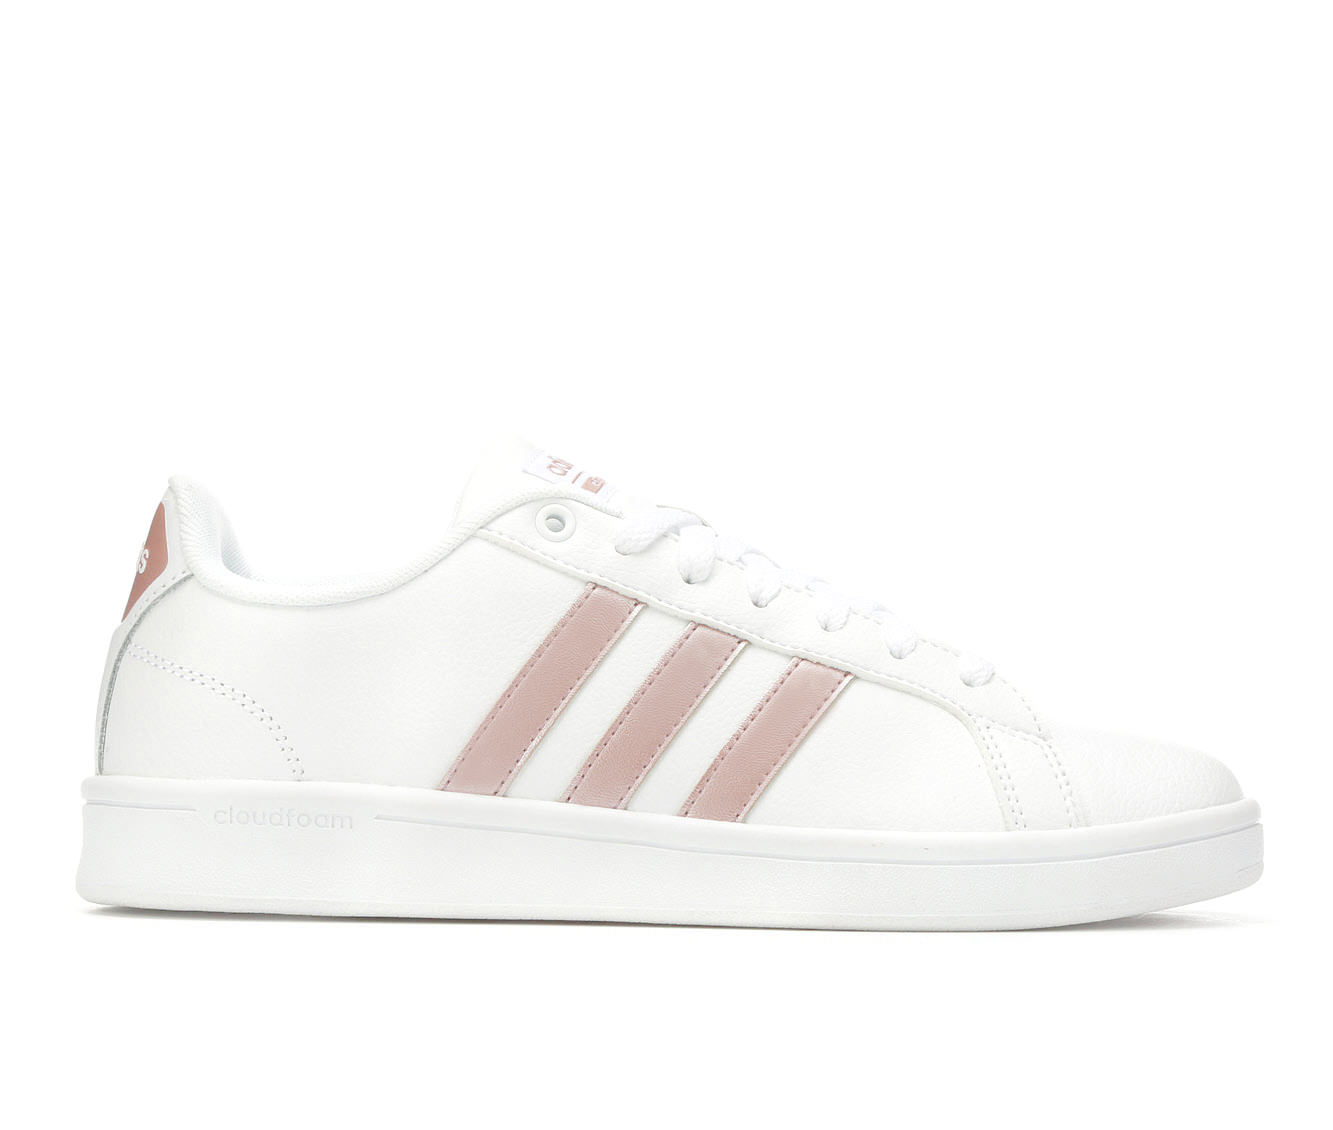 Adidas Advantage Stripes